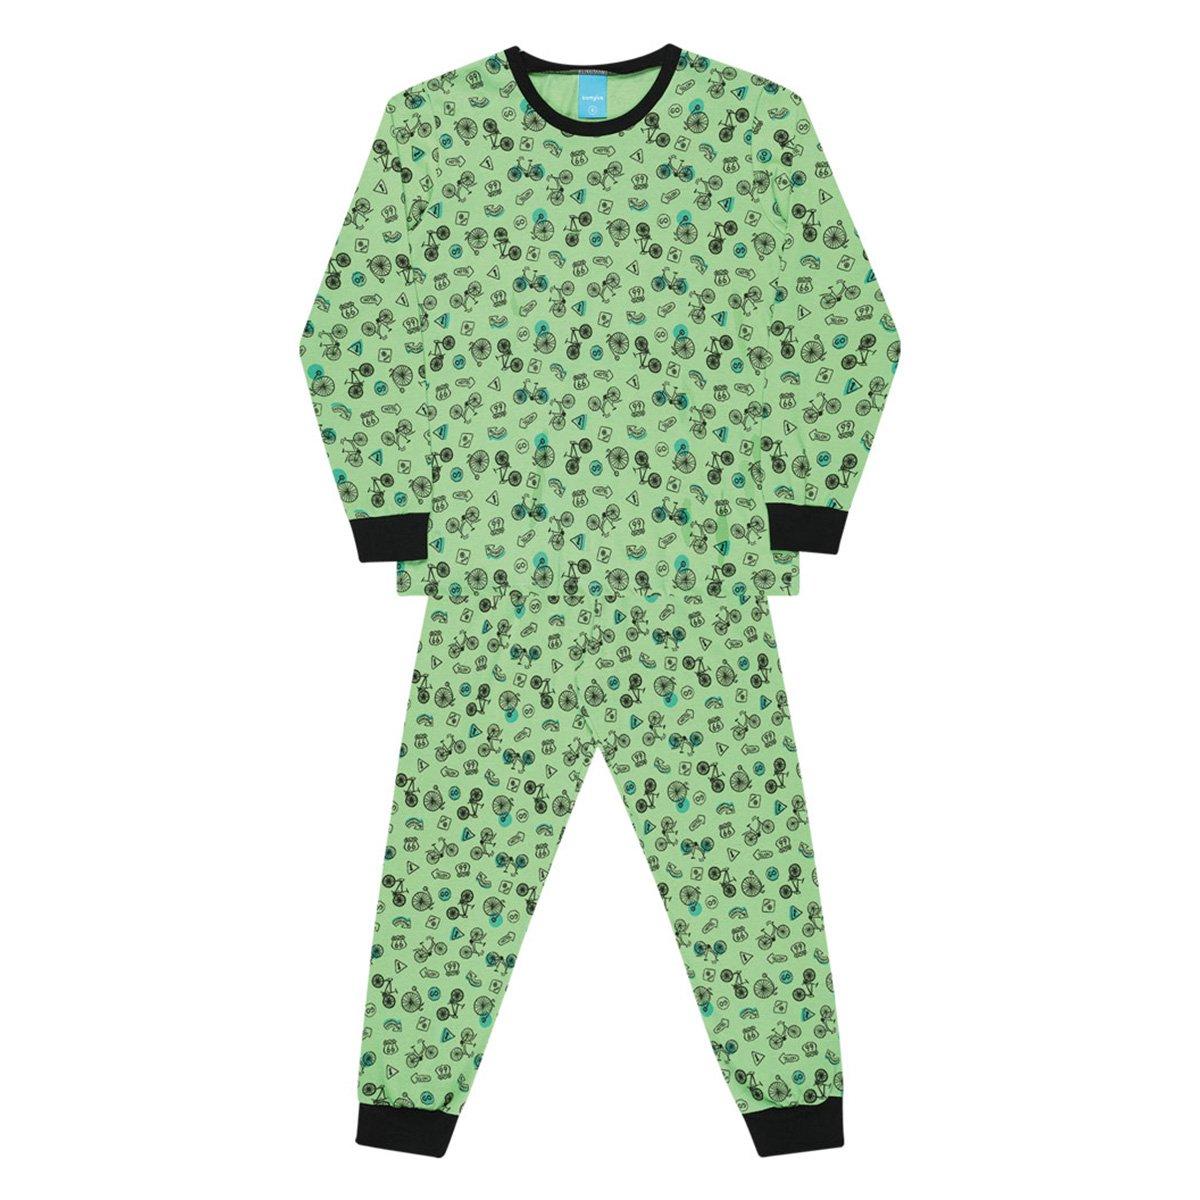 Pijama Infantil Longo Kamylus Meia Malha Estampado